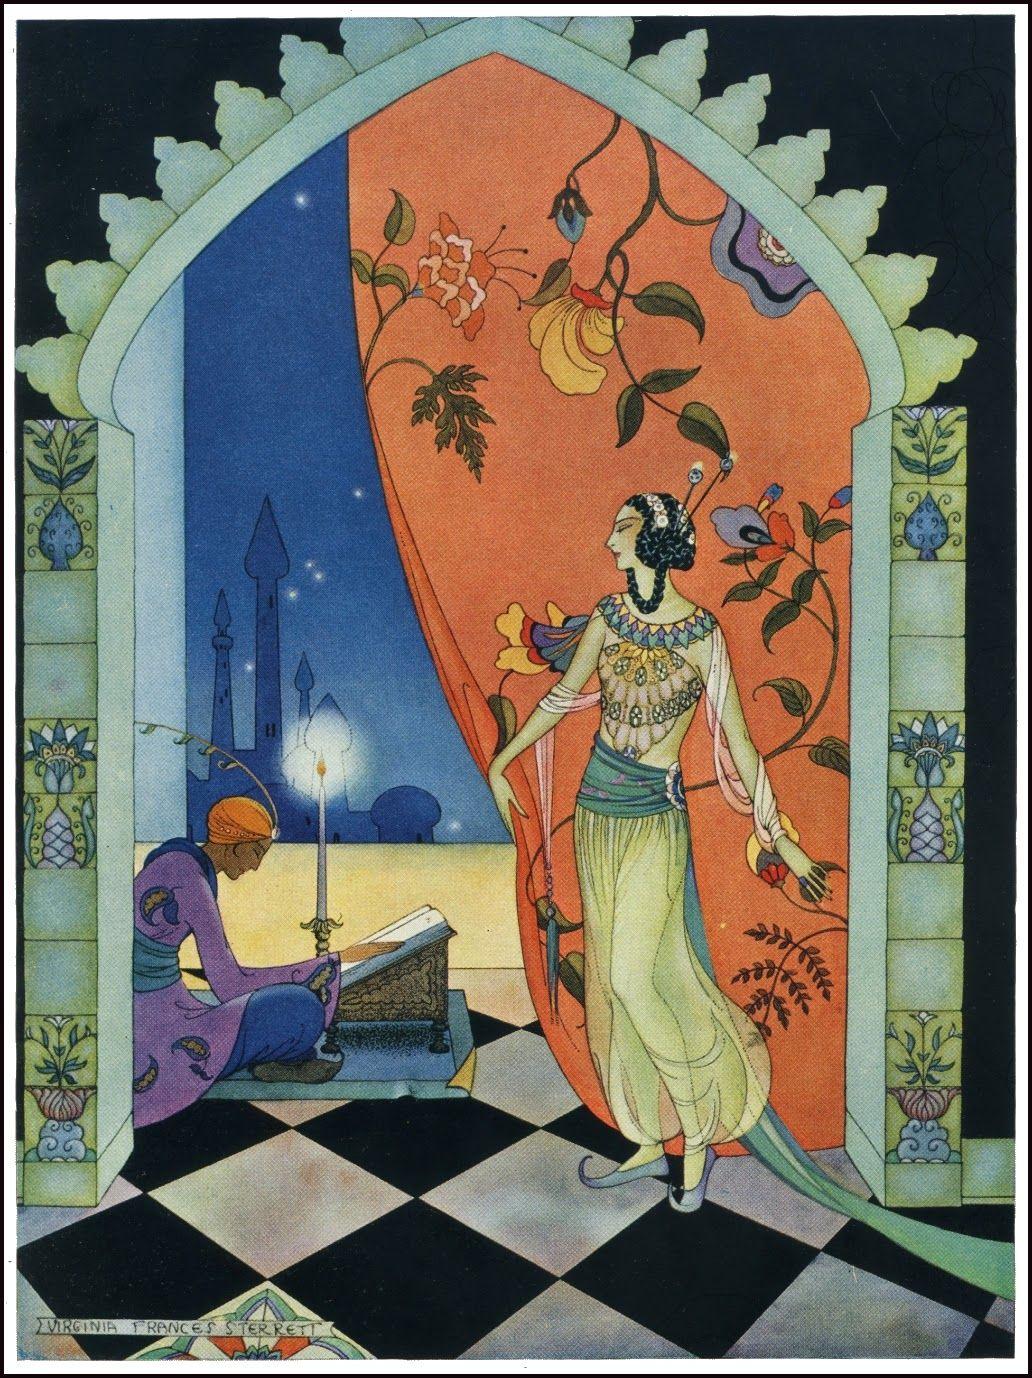 Arabian Nights Sterrett Princess S Great Beauty Marchen Kunst Art And Illustration Vintage Illustration